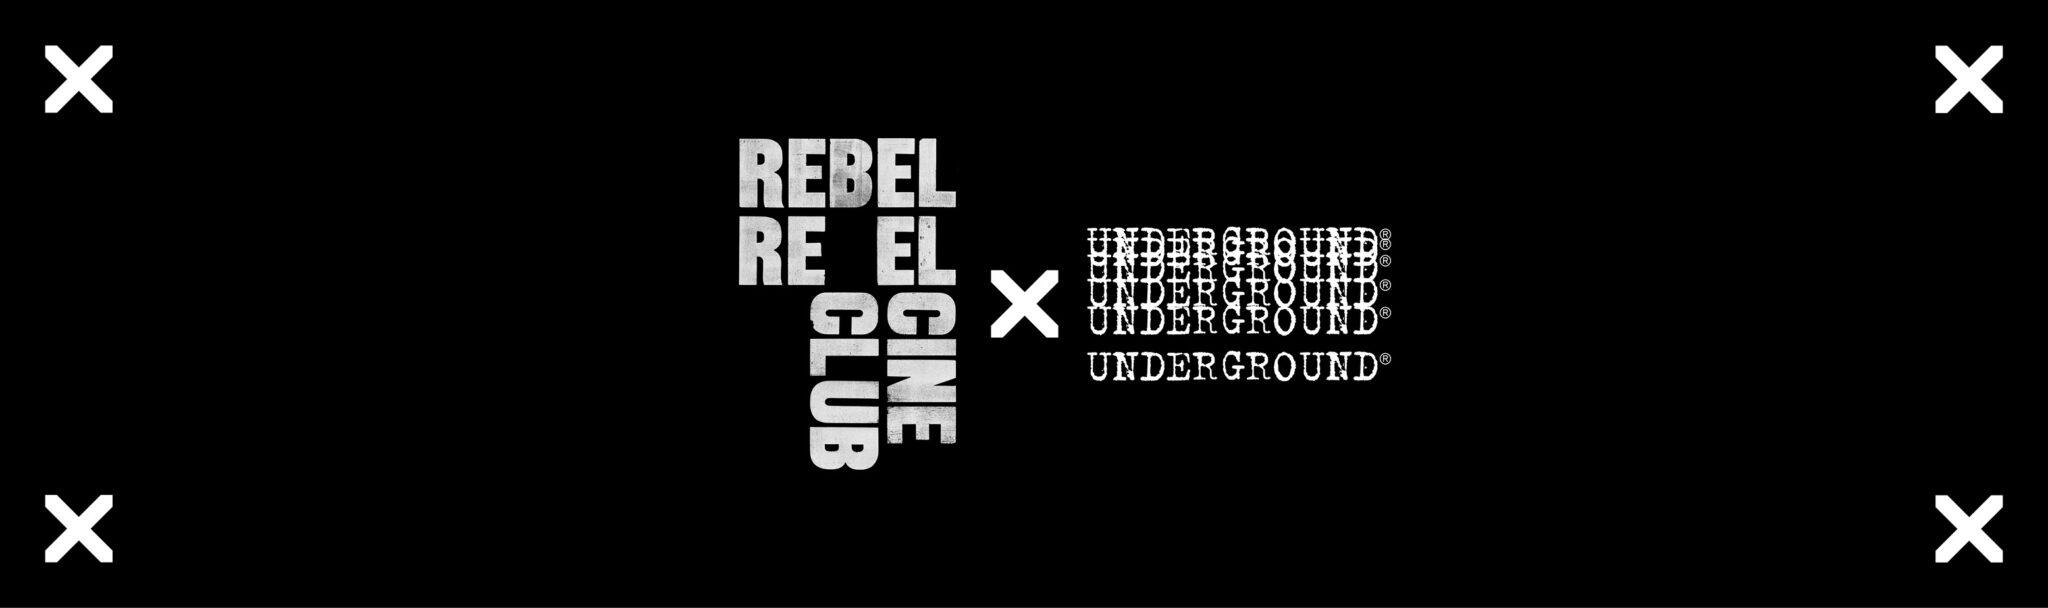 Underground England and Rebel Reels collaboration bannner